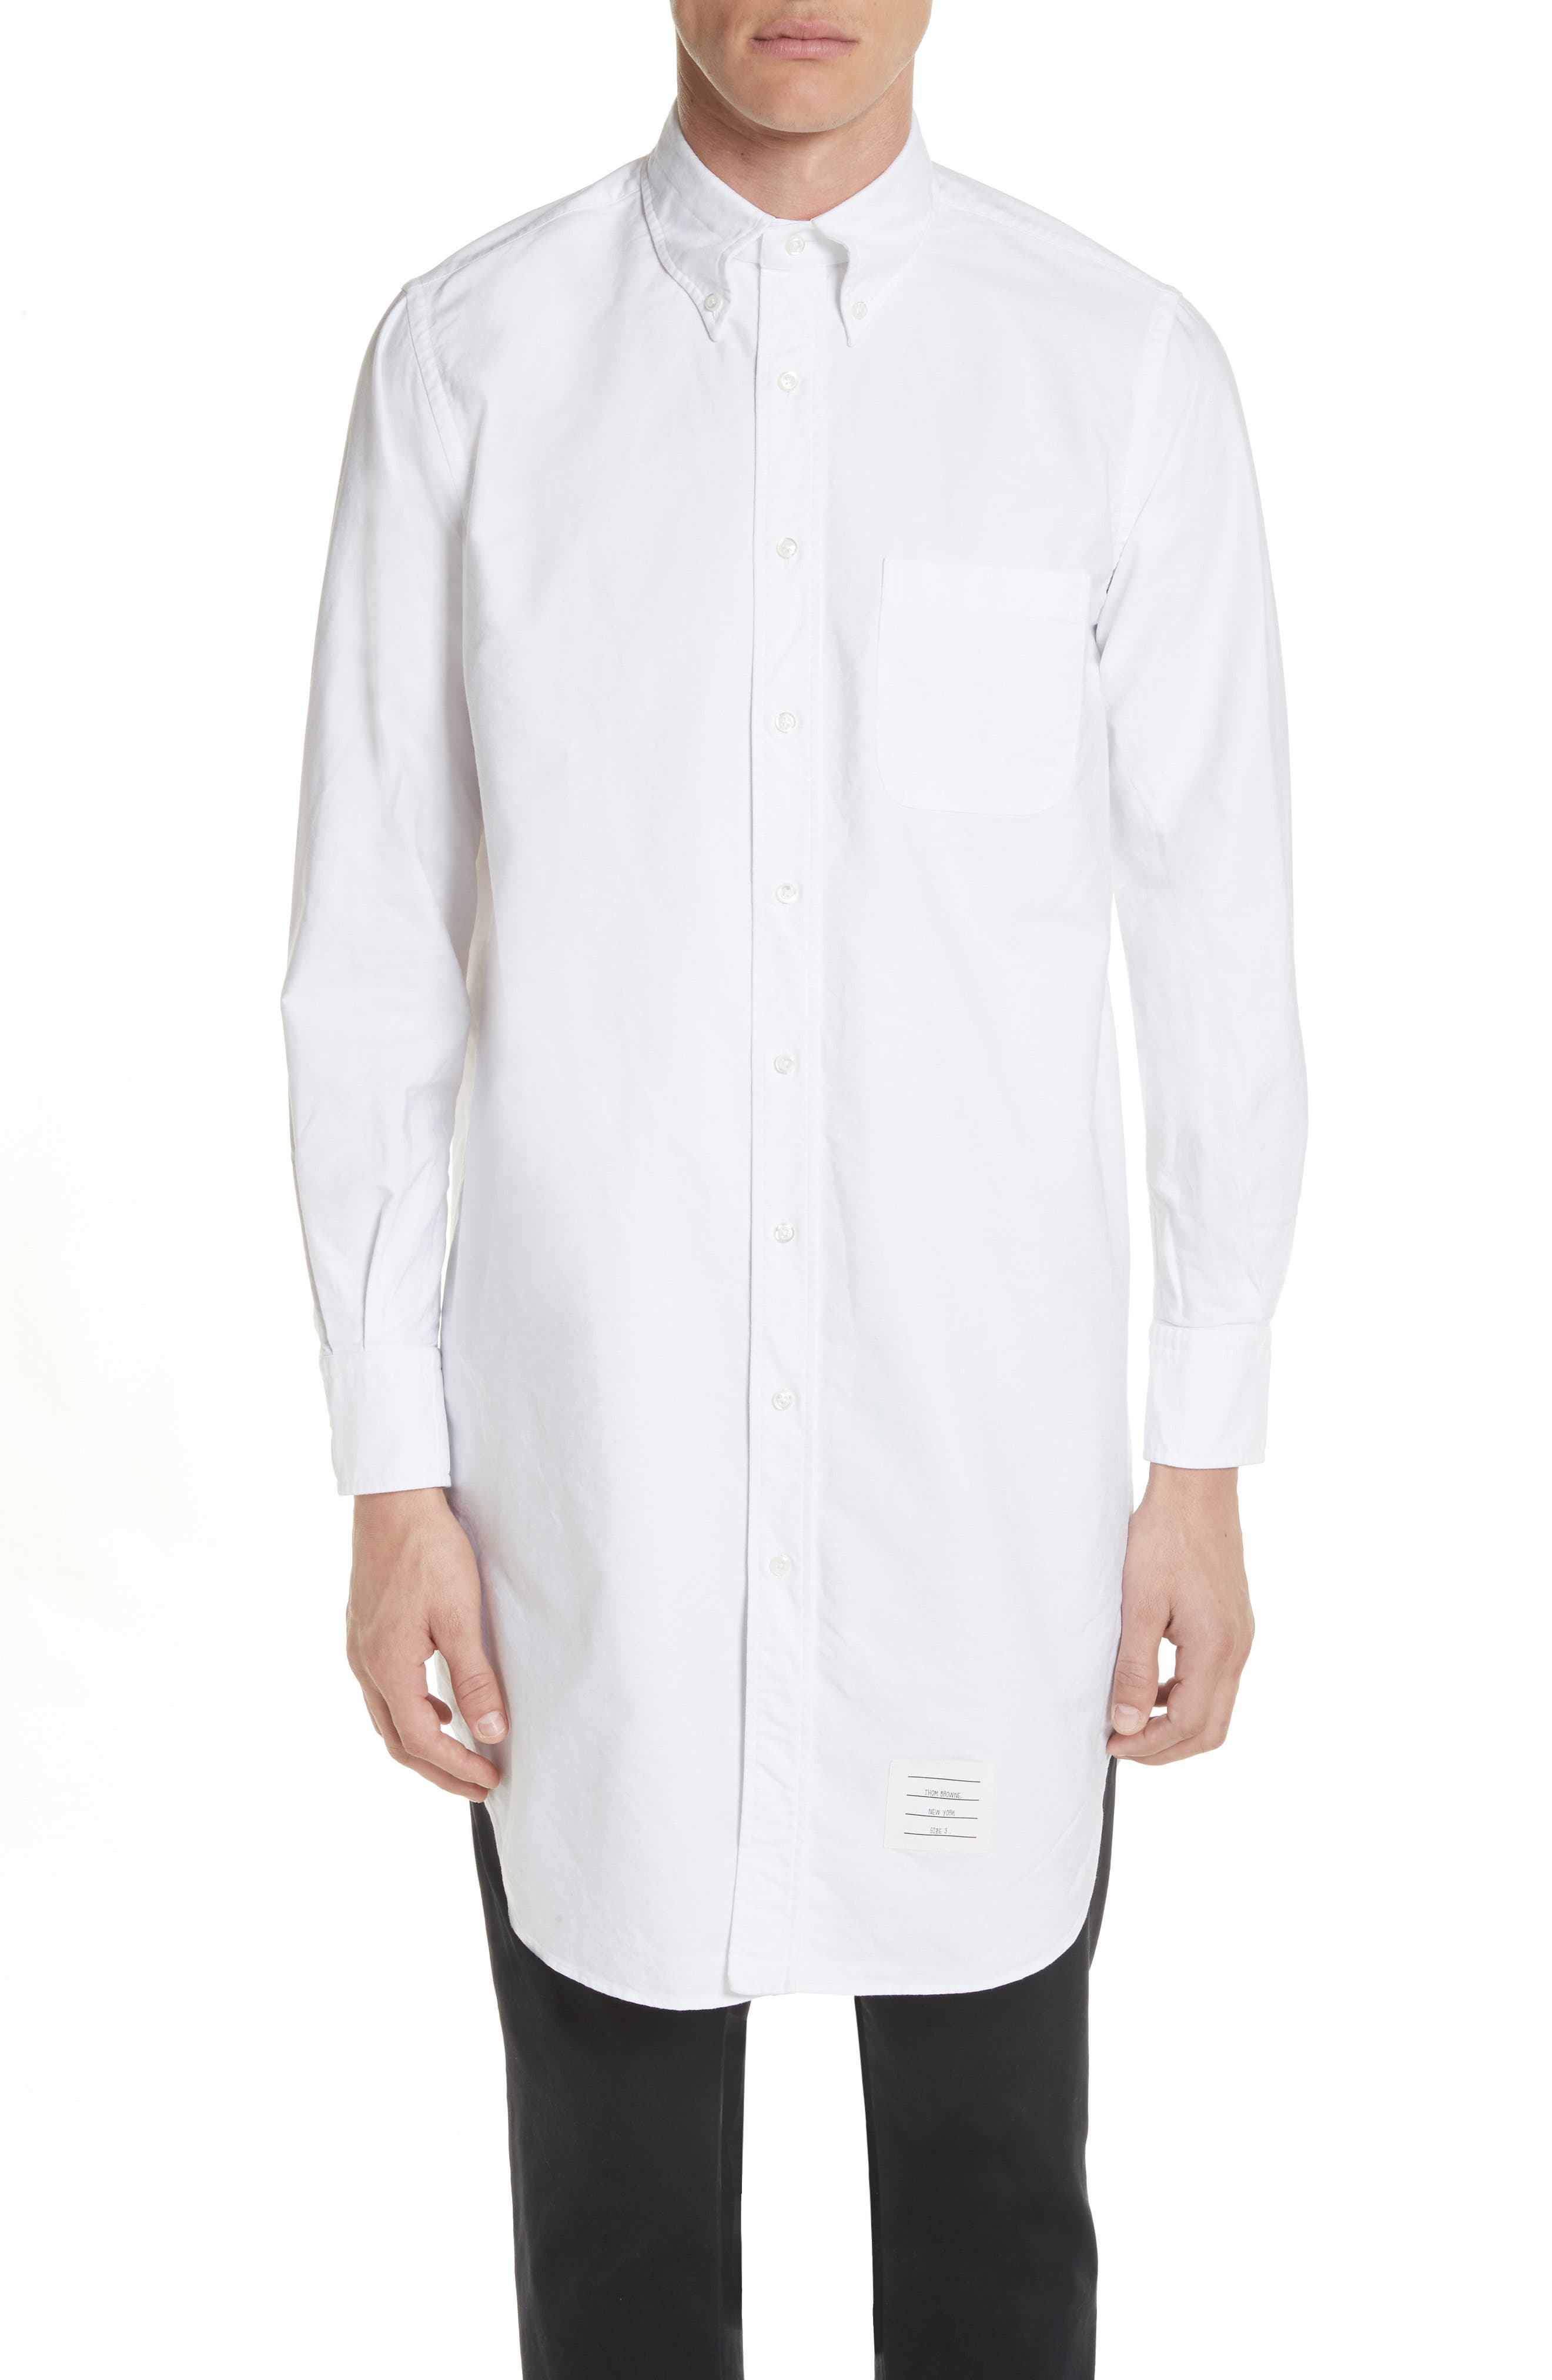 Thom Browne Elongated Woven Shirt